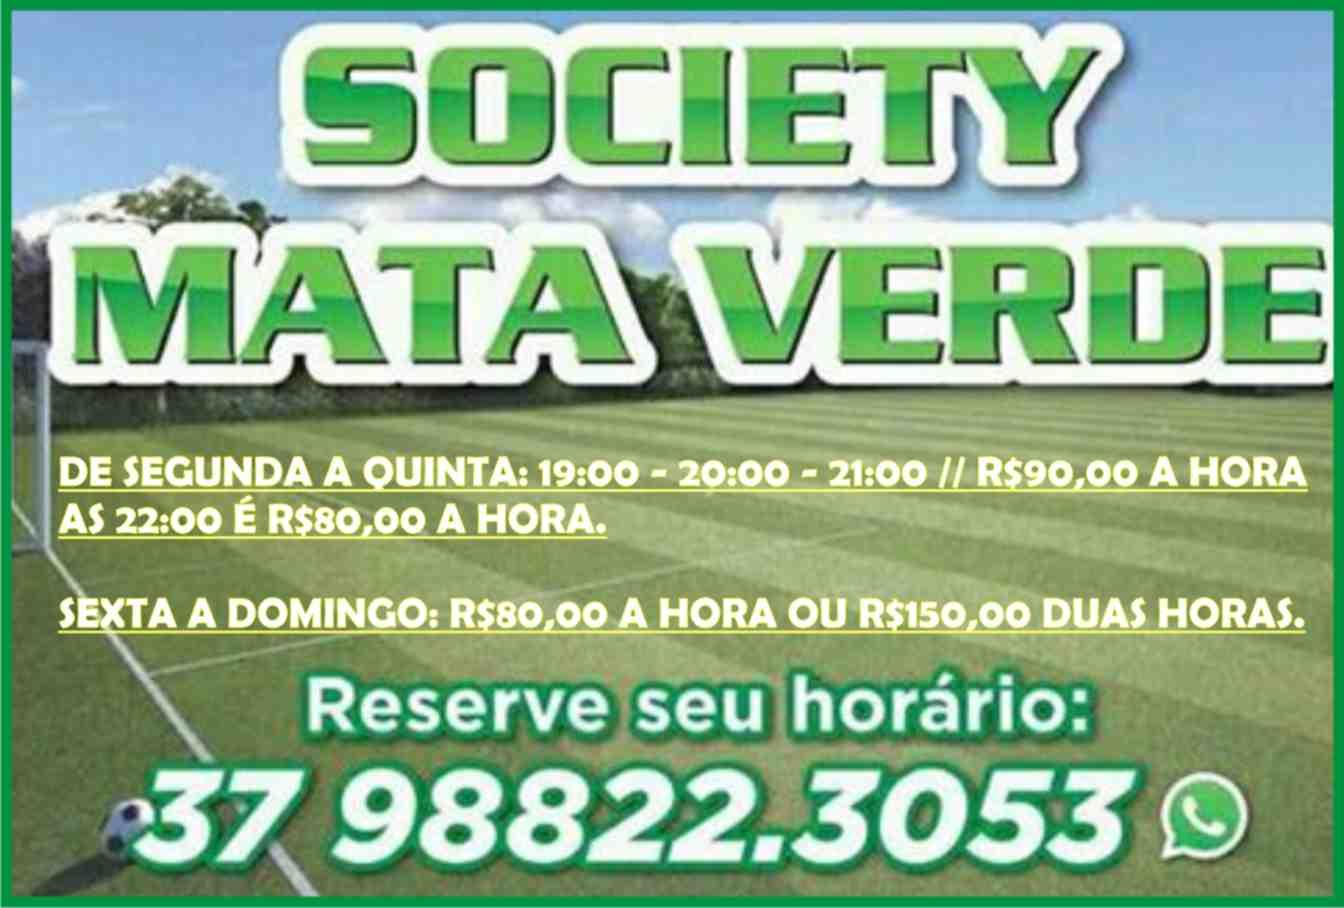 SOCIETY MATA VERDE